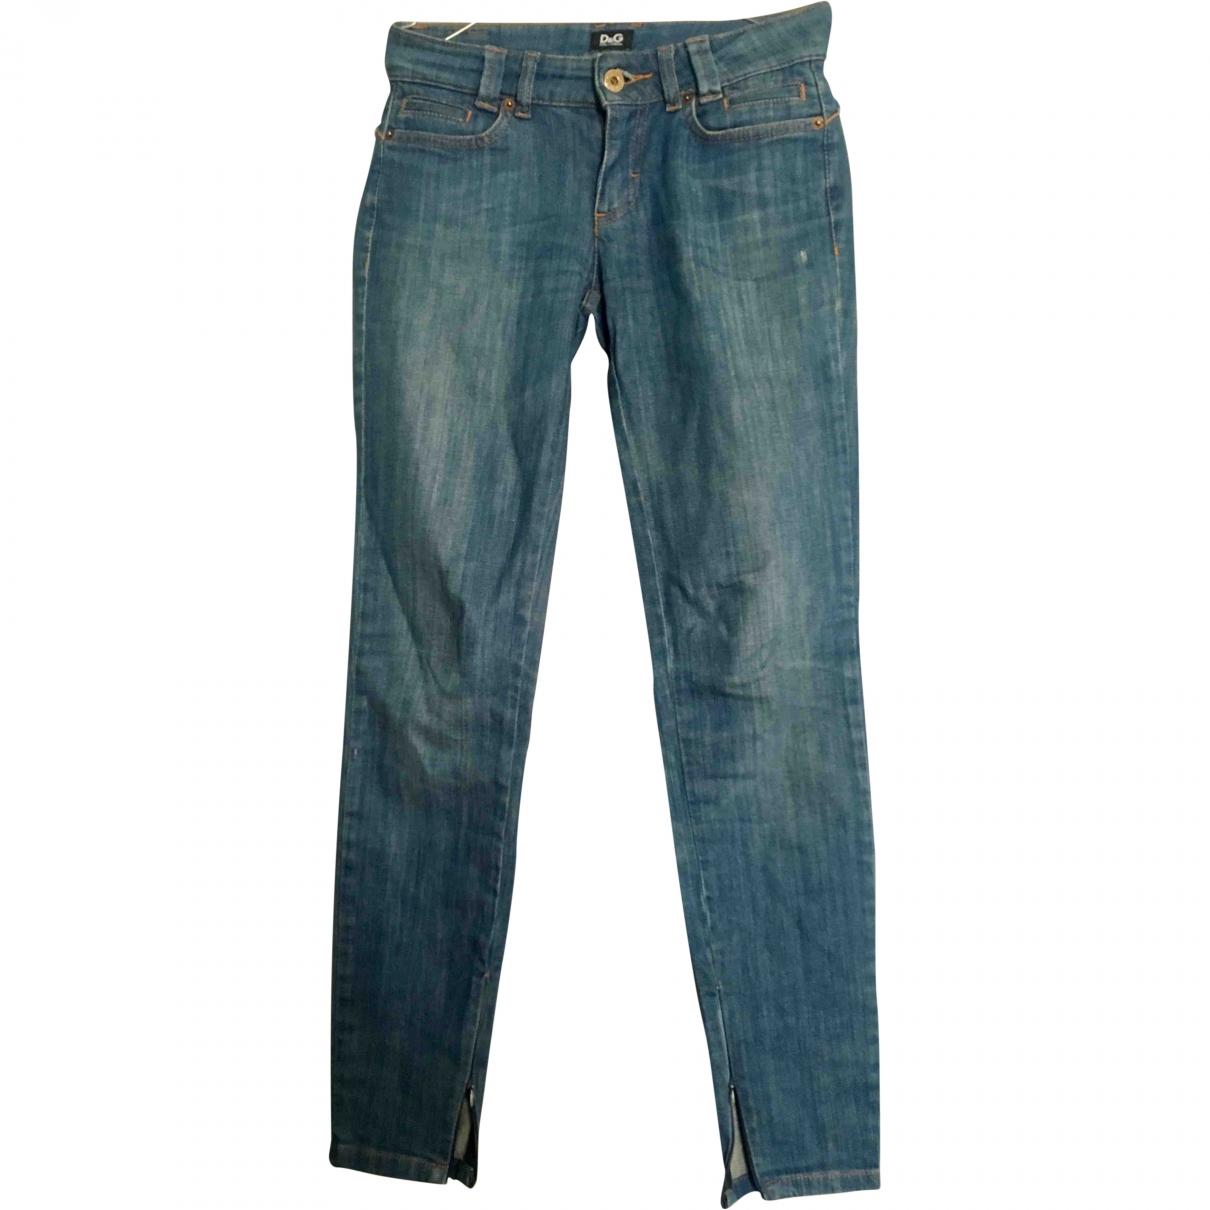 D&g \N Denim - Jeans Jeans for Women 24 US